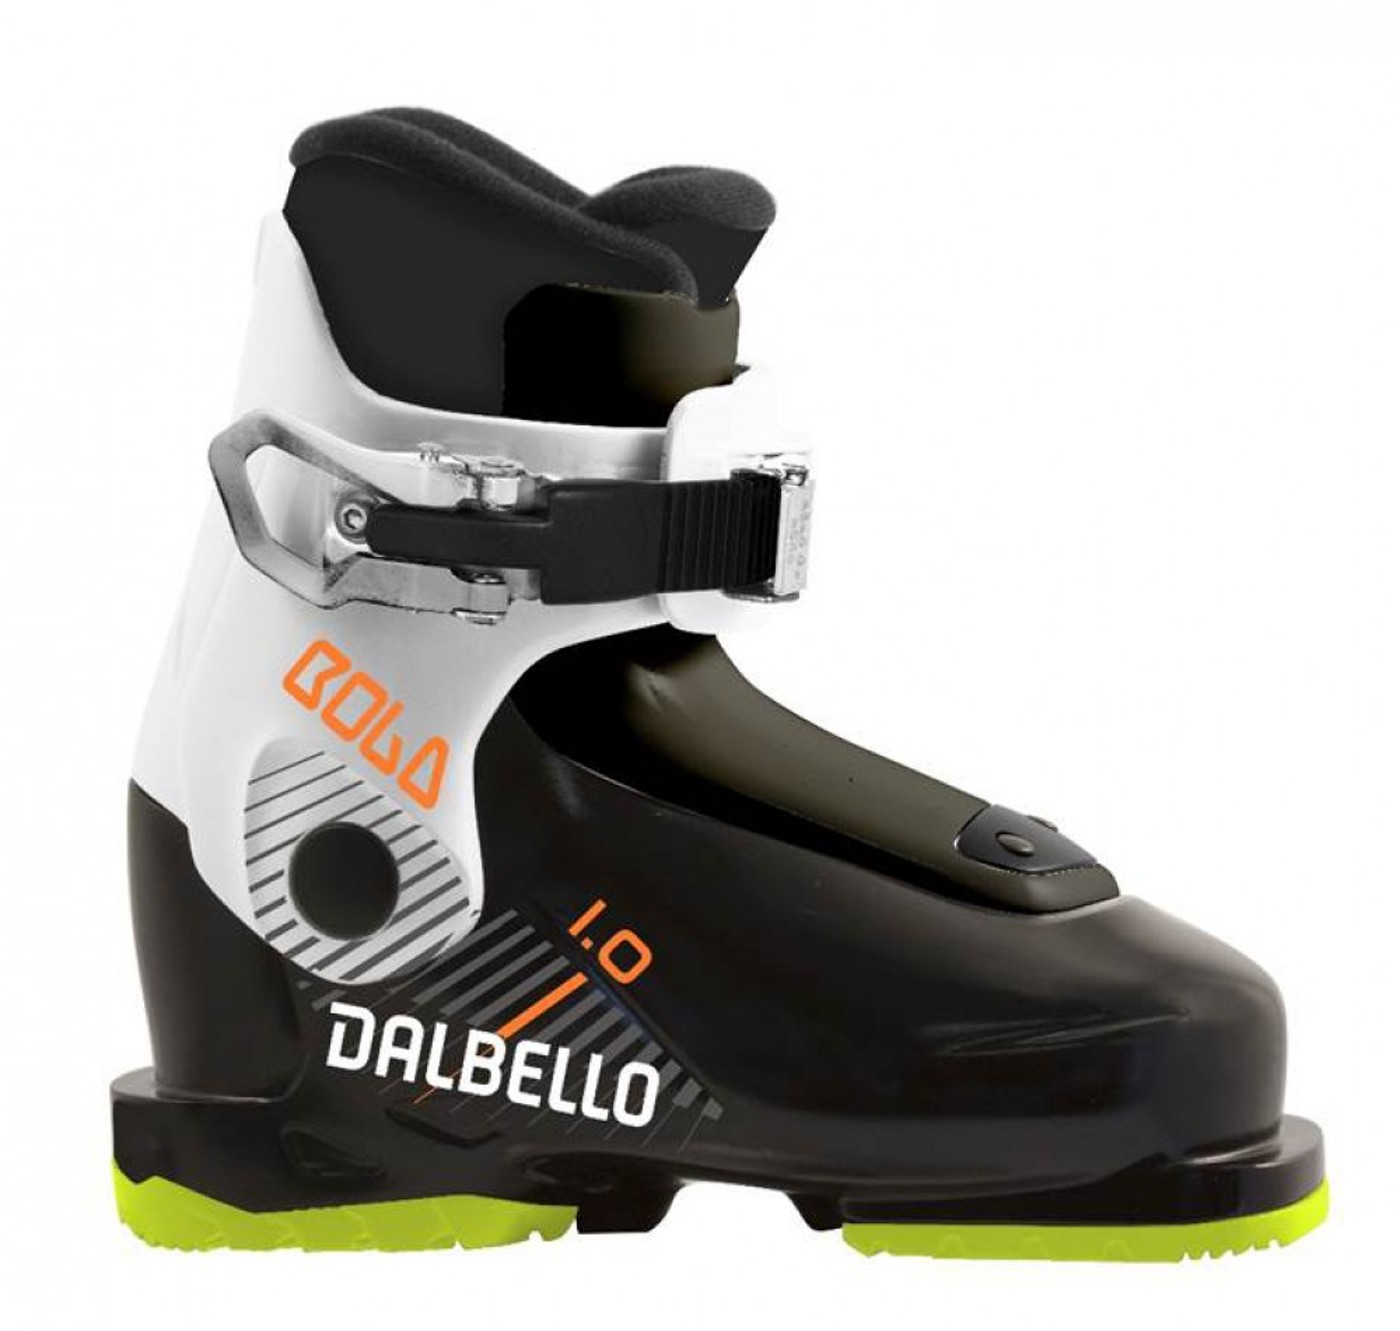 DALBELLO RTL-BOLD 1.0 - Kinder